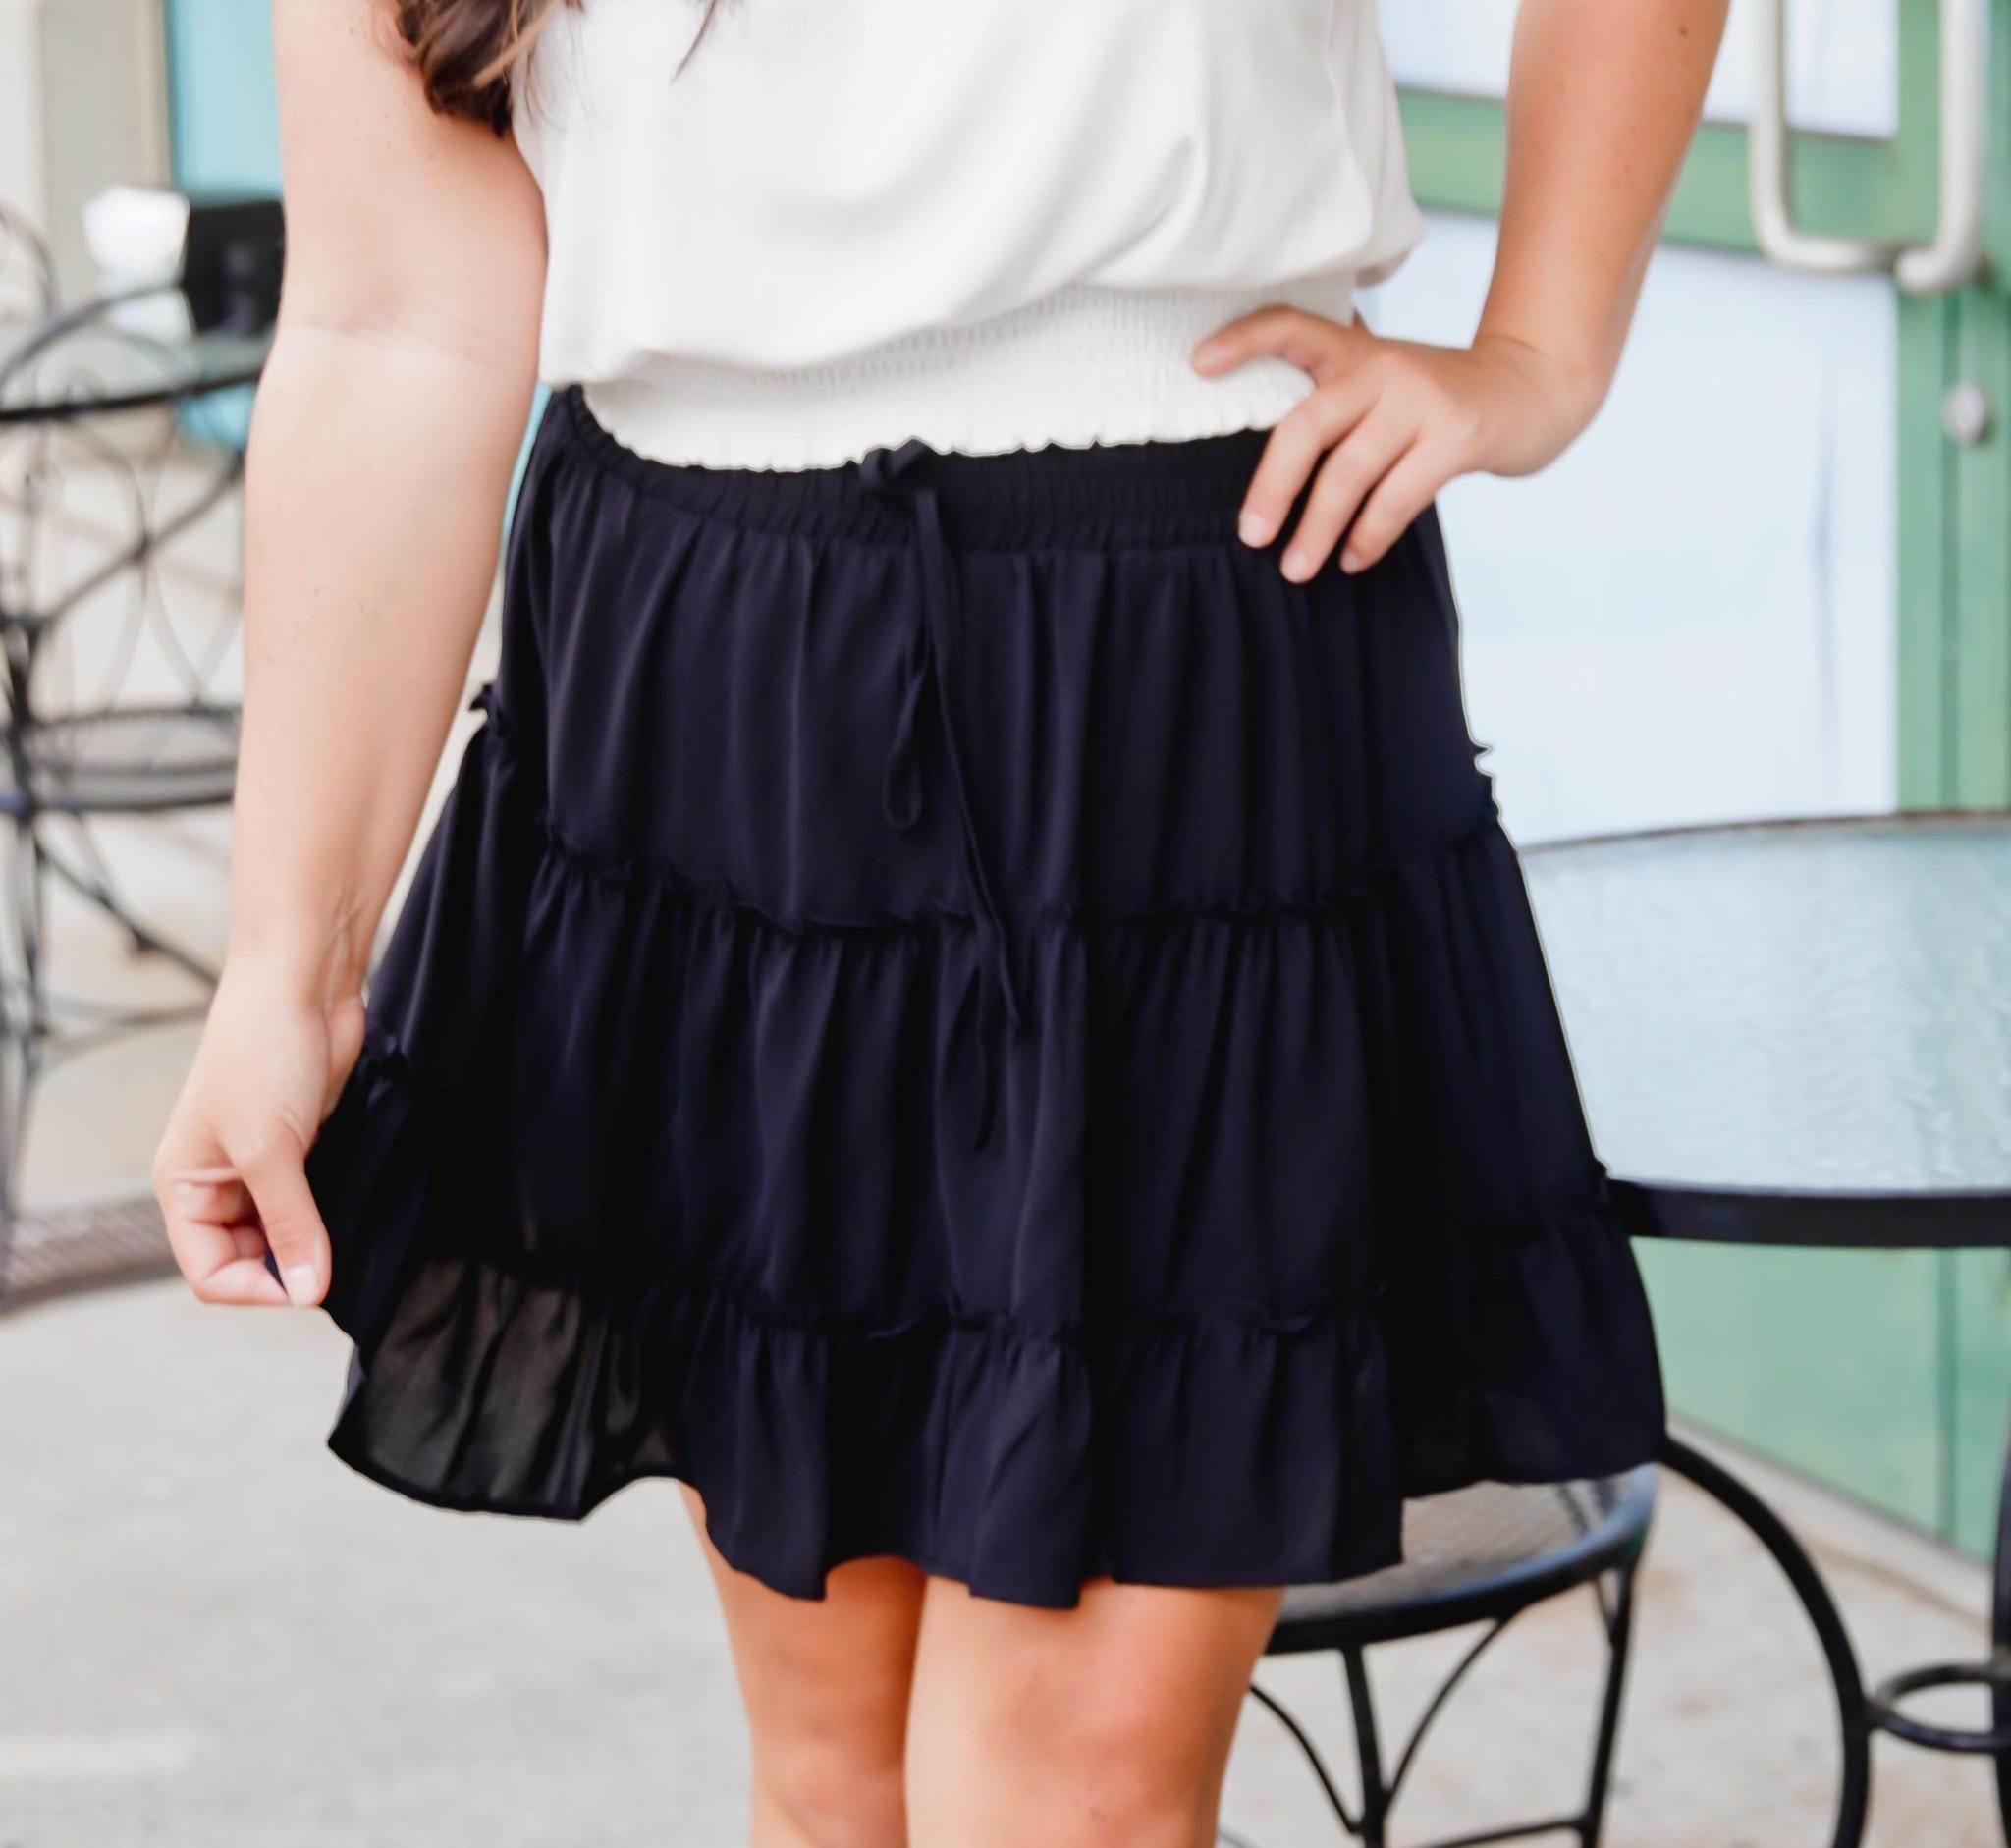 Black High Waisted Tiered Skirt